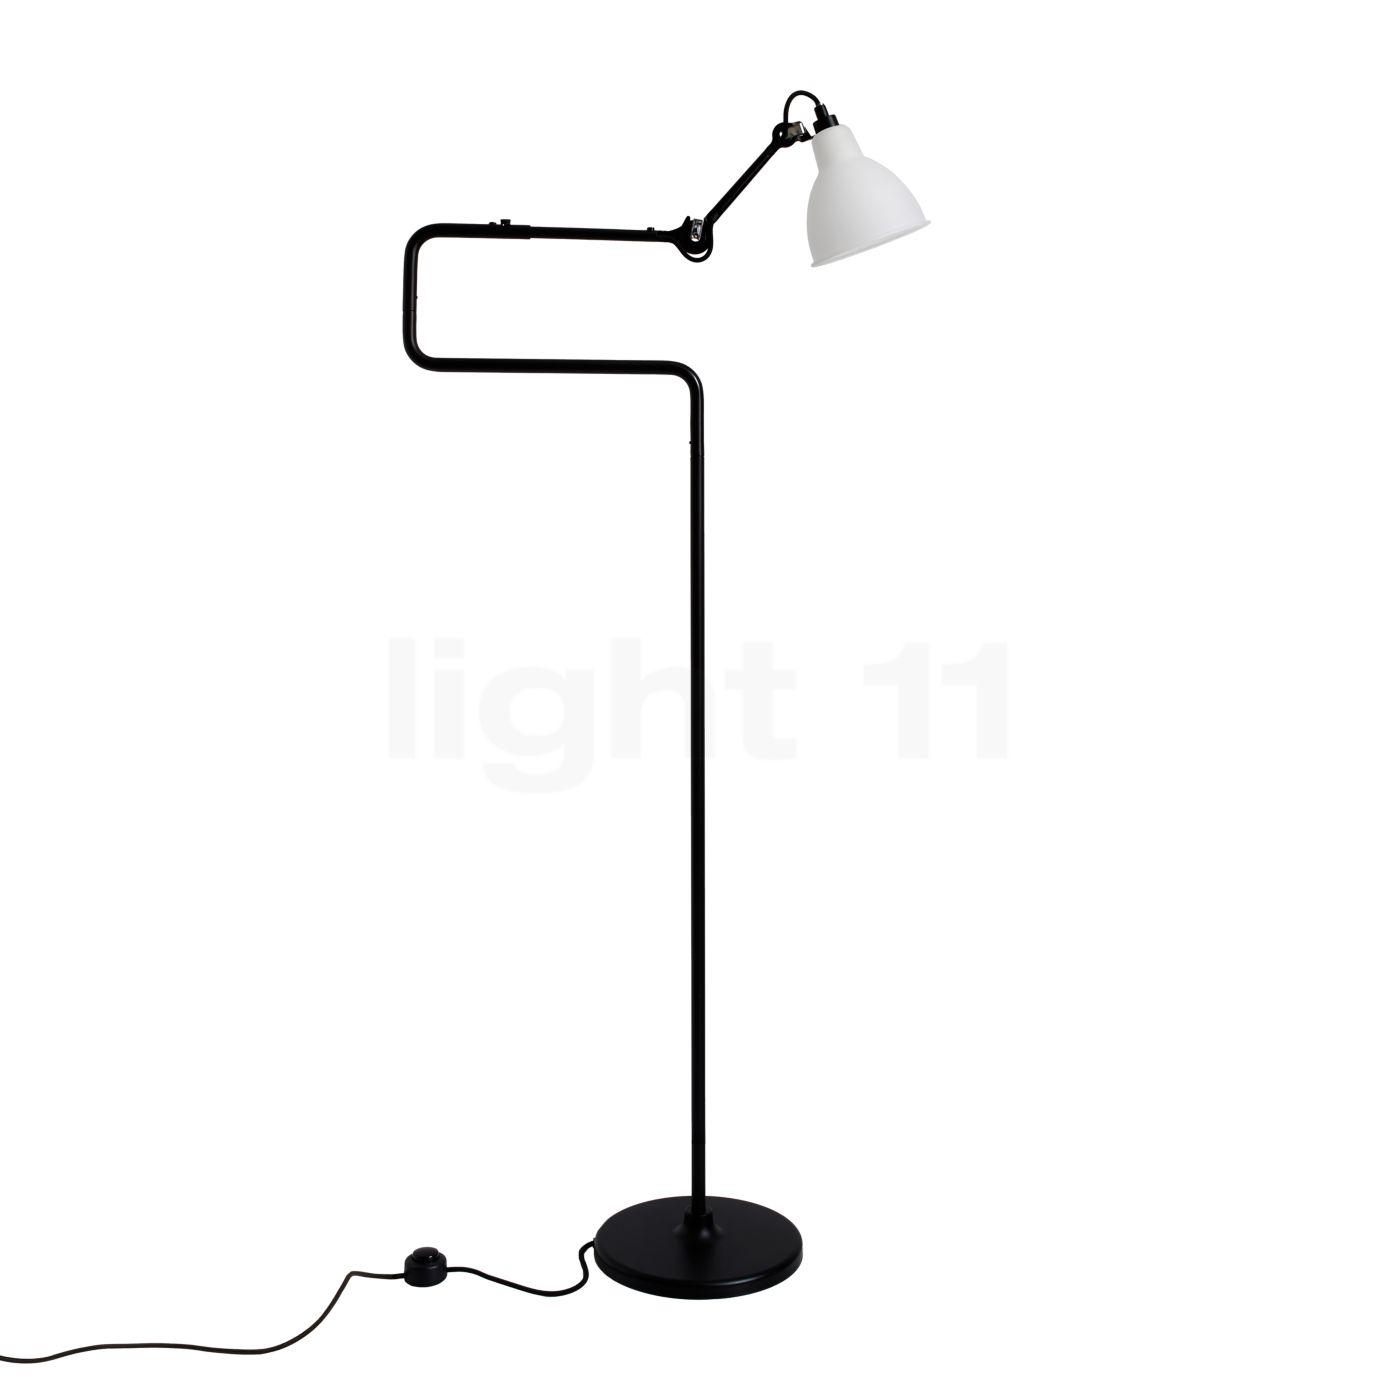 floor lamp clipart black and white. floor lamp clipart black and white